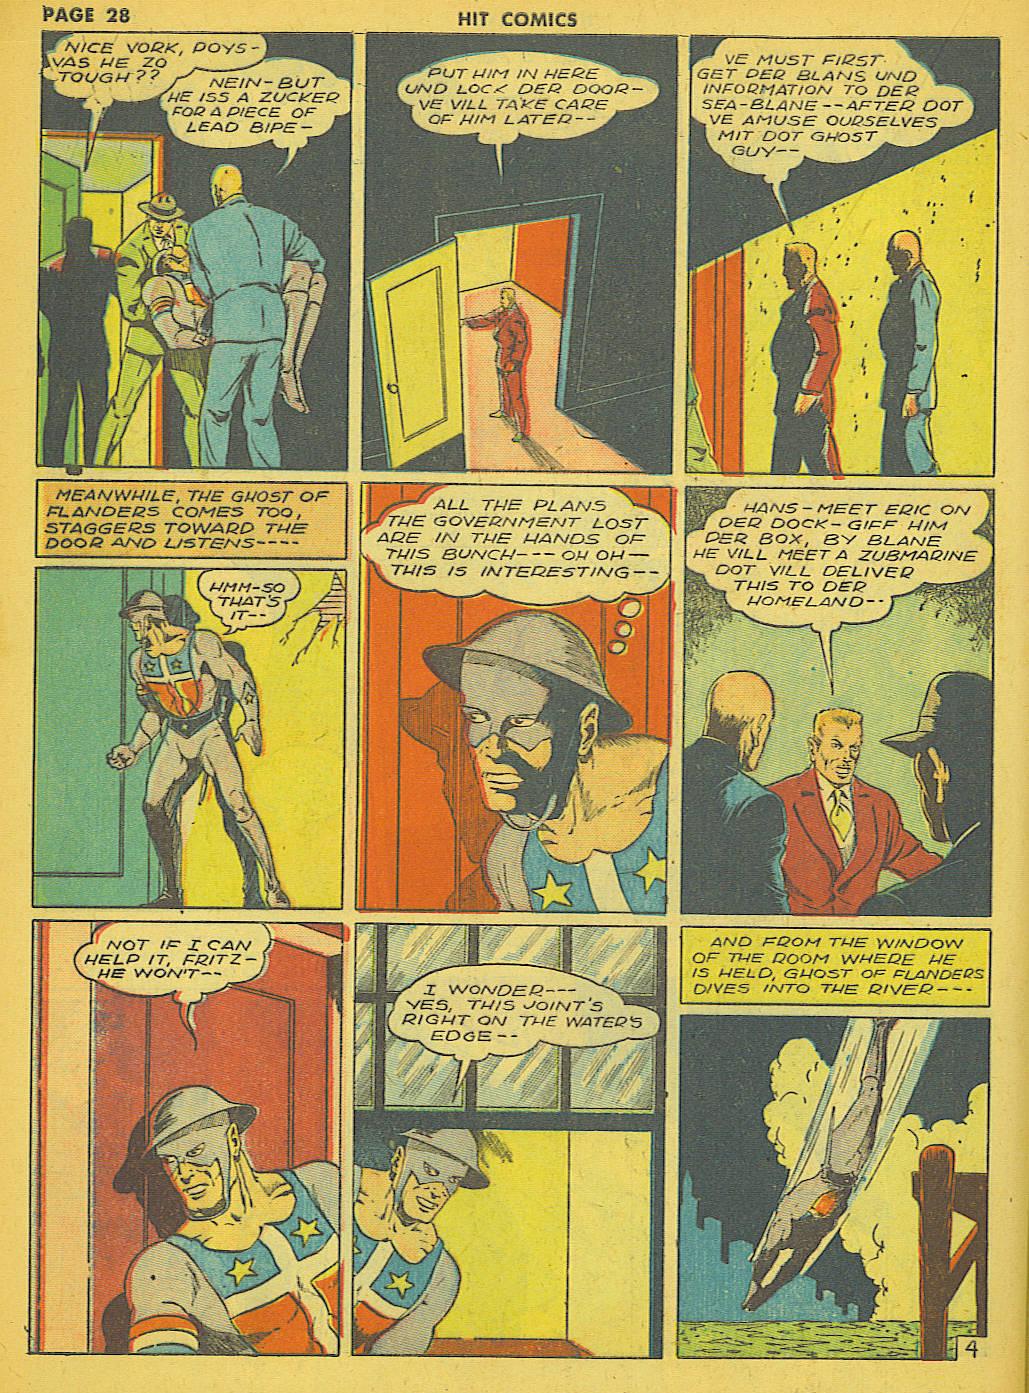 Read online Hit Comics comic -  Issue #21 - 30